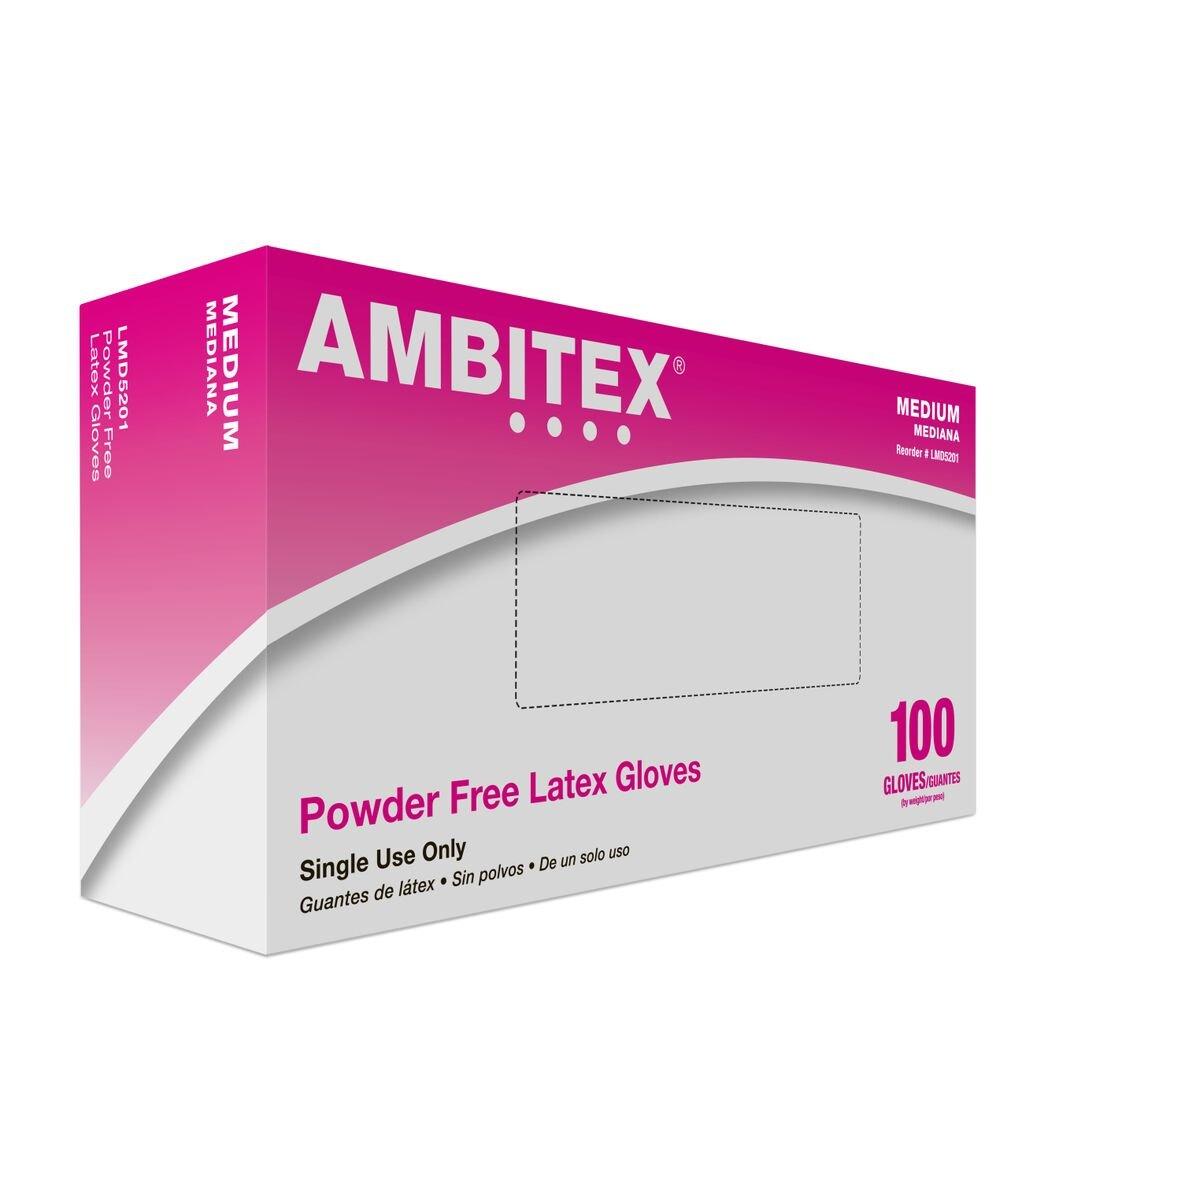 Tradex LMD5201 Ambitex Latex Powdered Free Multi-Purpose Gloves, Medium, Cream (Pack of 1000)